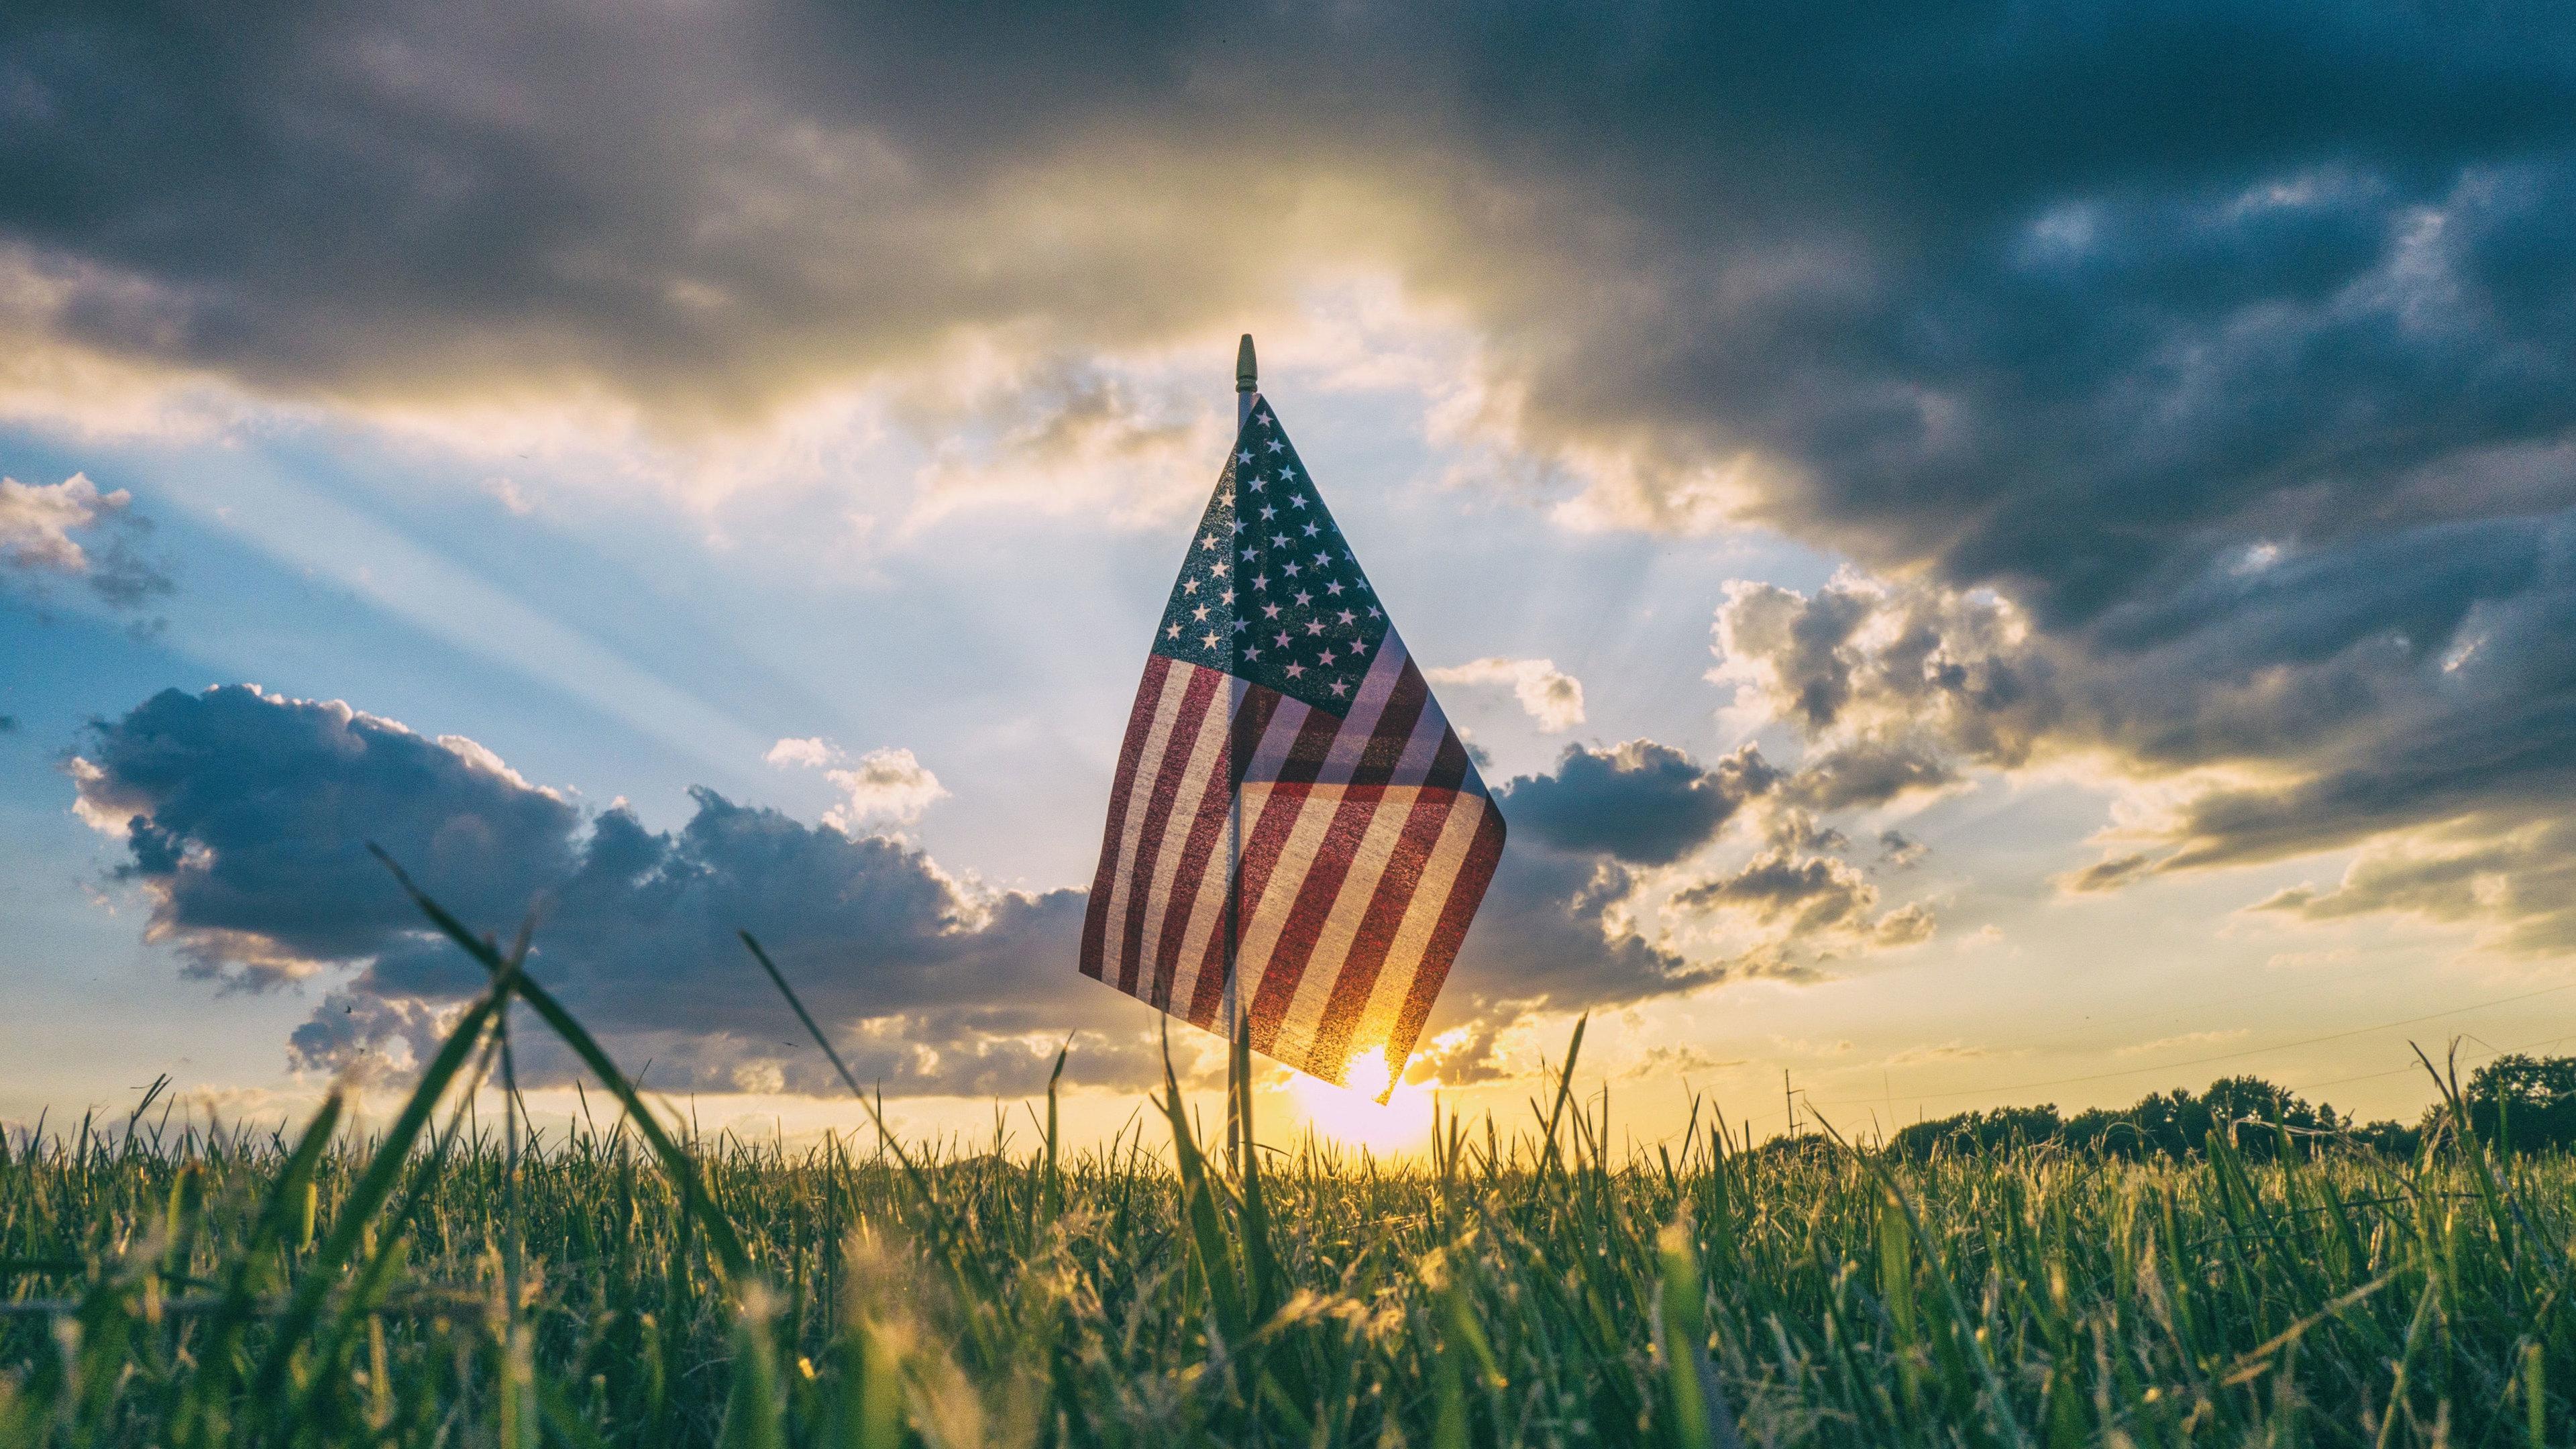 america flag inside field grass 4k 1538069349 - America Flag Inside Field Grass 4k - world wallpapers, hd-wallpapers, grass wallpapers, flag wallpapers, field wallpapers, america wallpapers, 4k-wallpapers